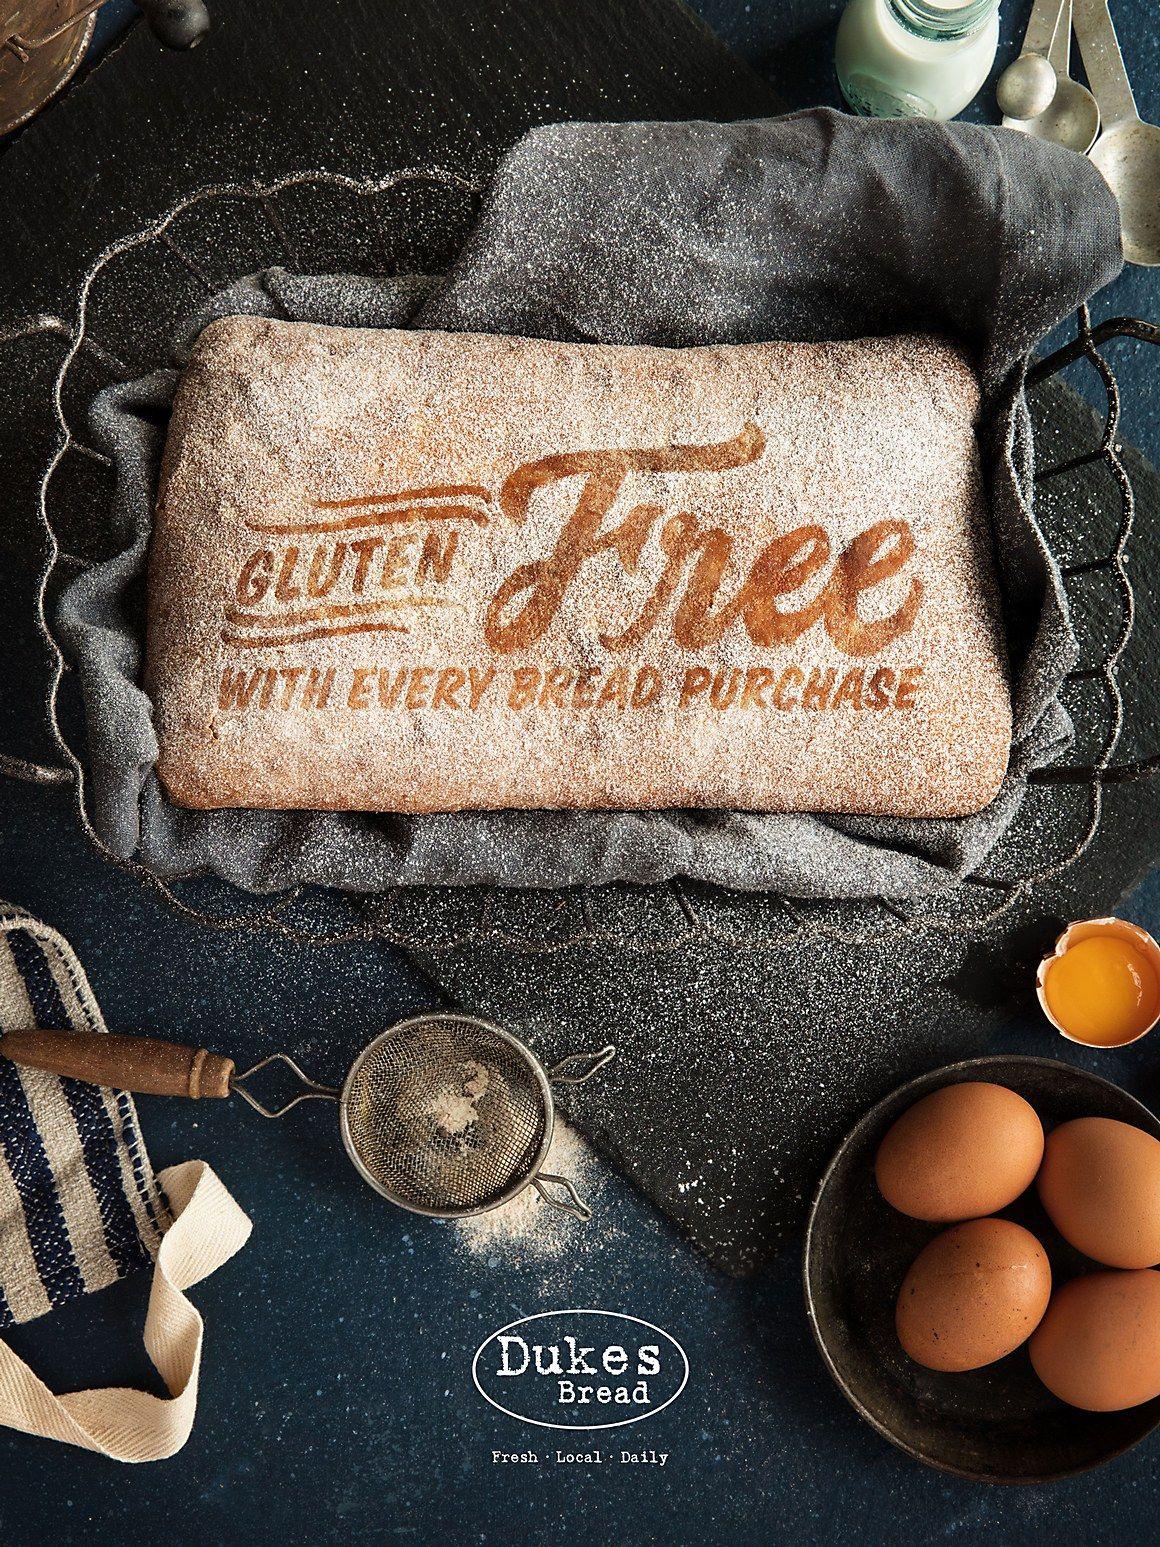 Dukes bread print ads food ads print ads food print